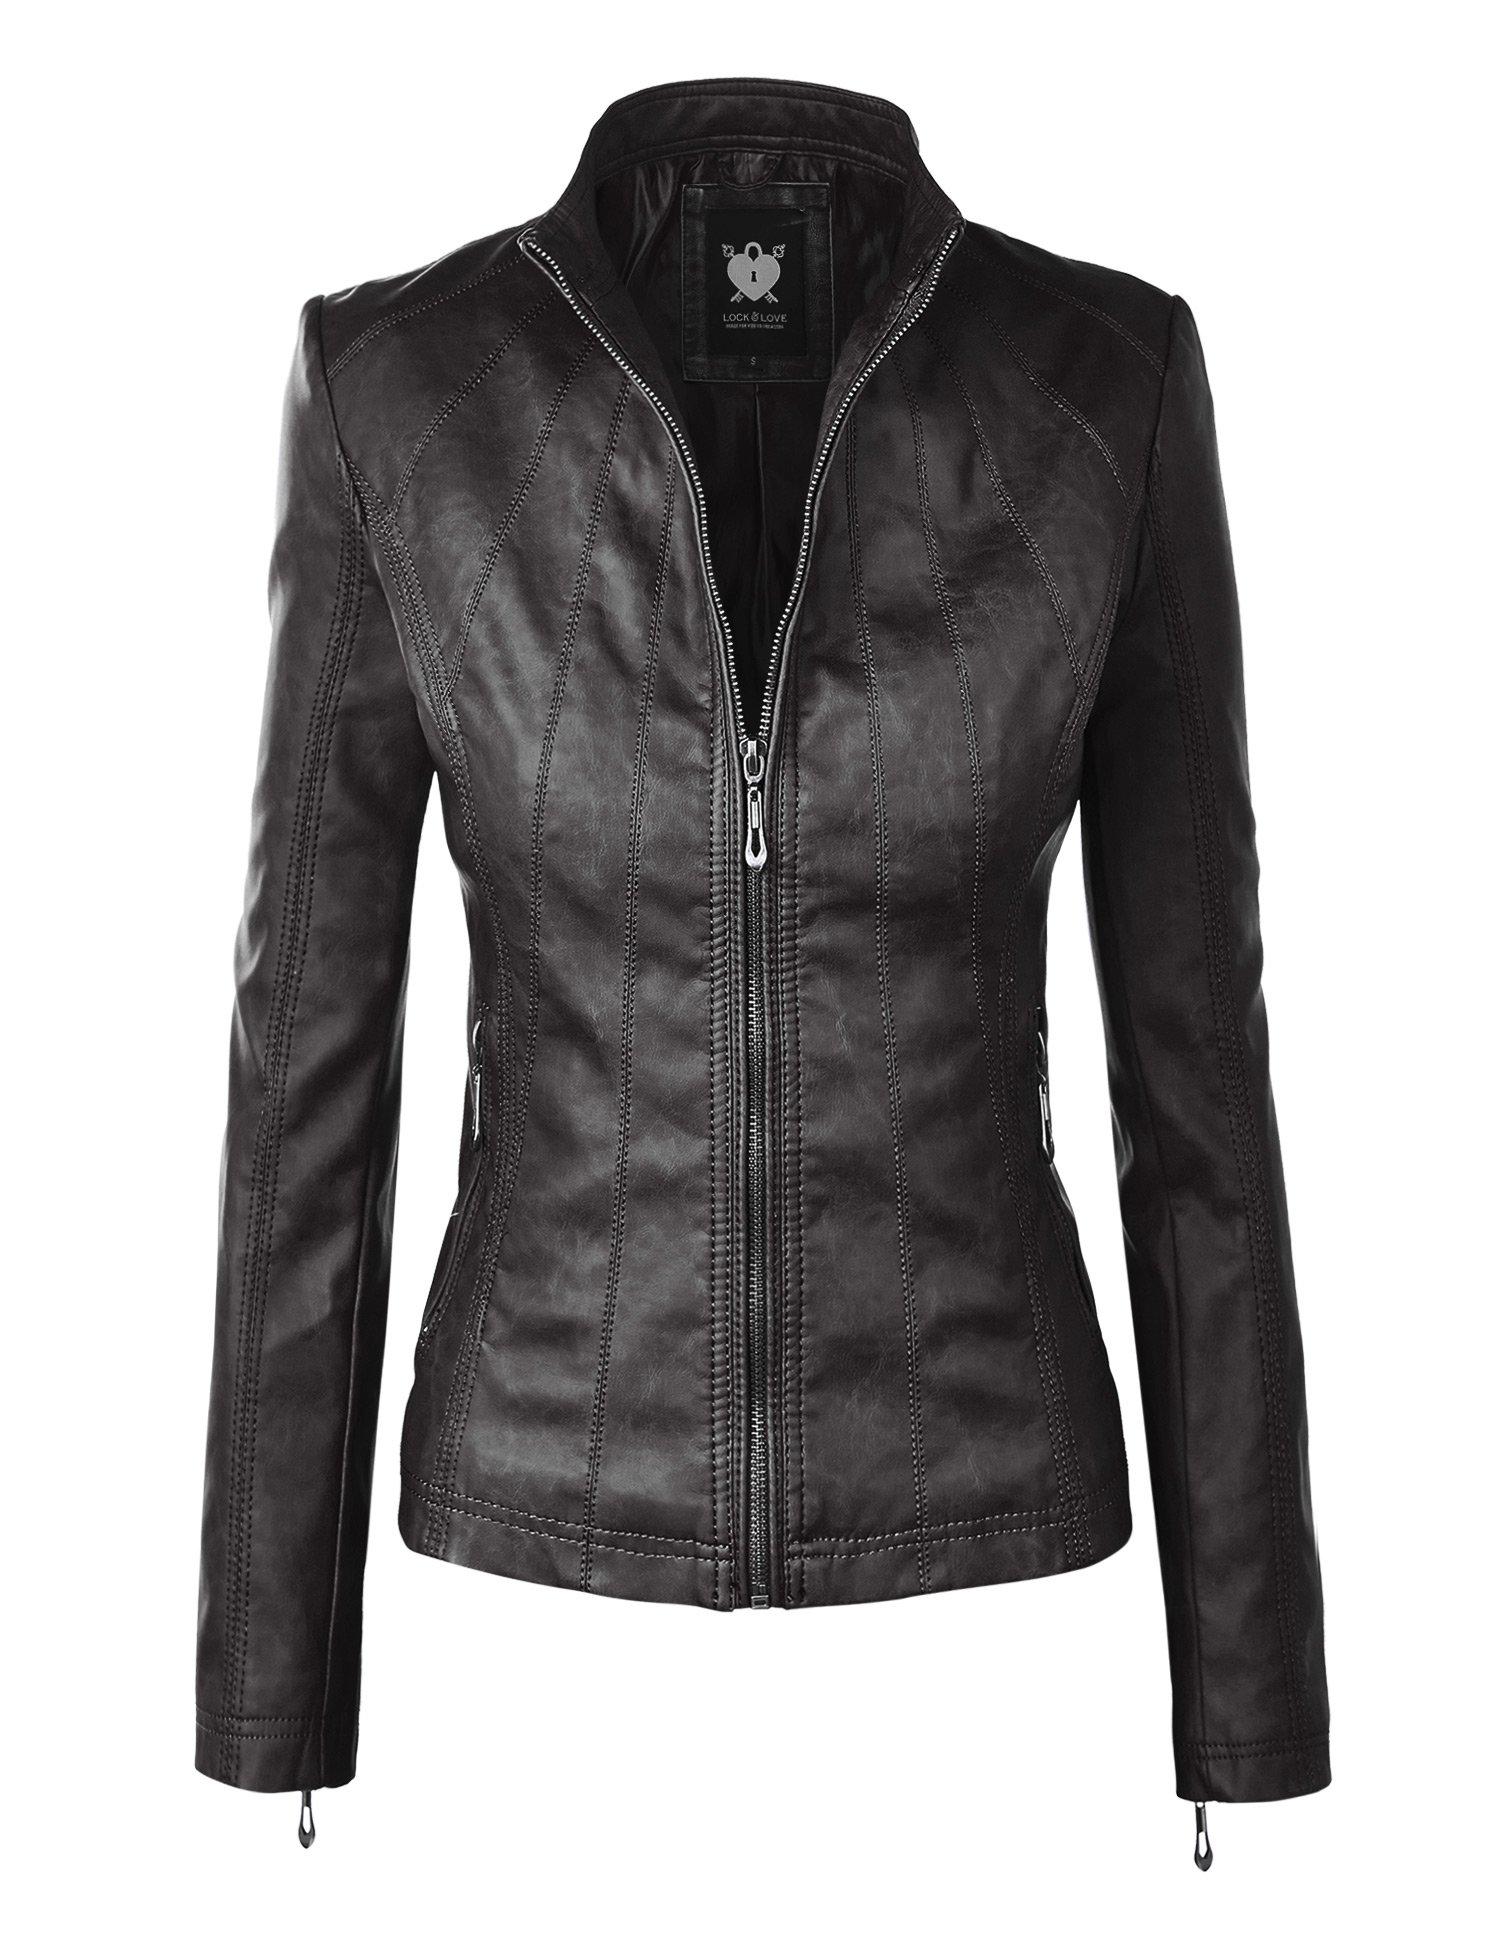 WJC877 Womens Panelled Faux Leather Moto Jacket XL BLACK